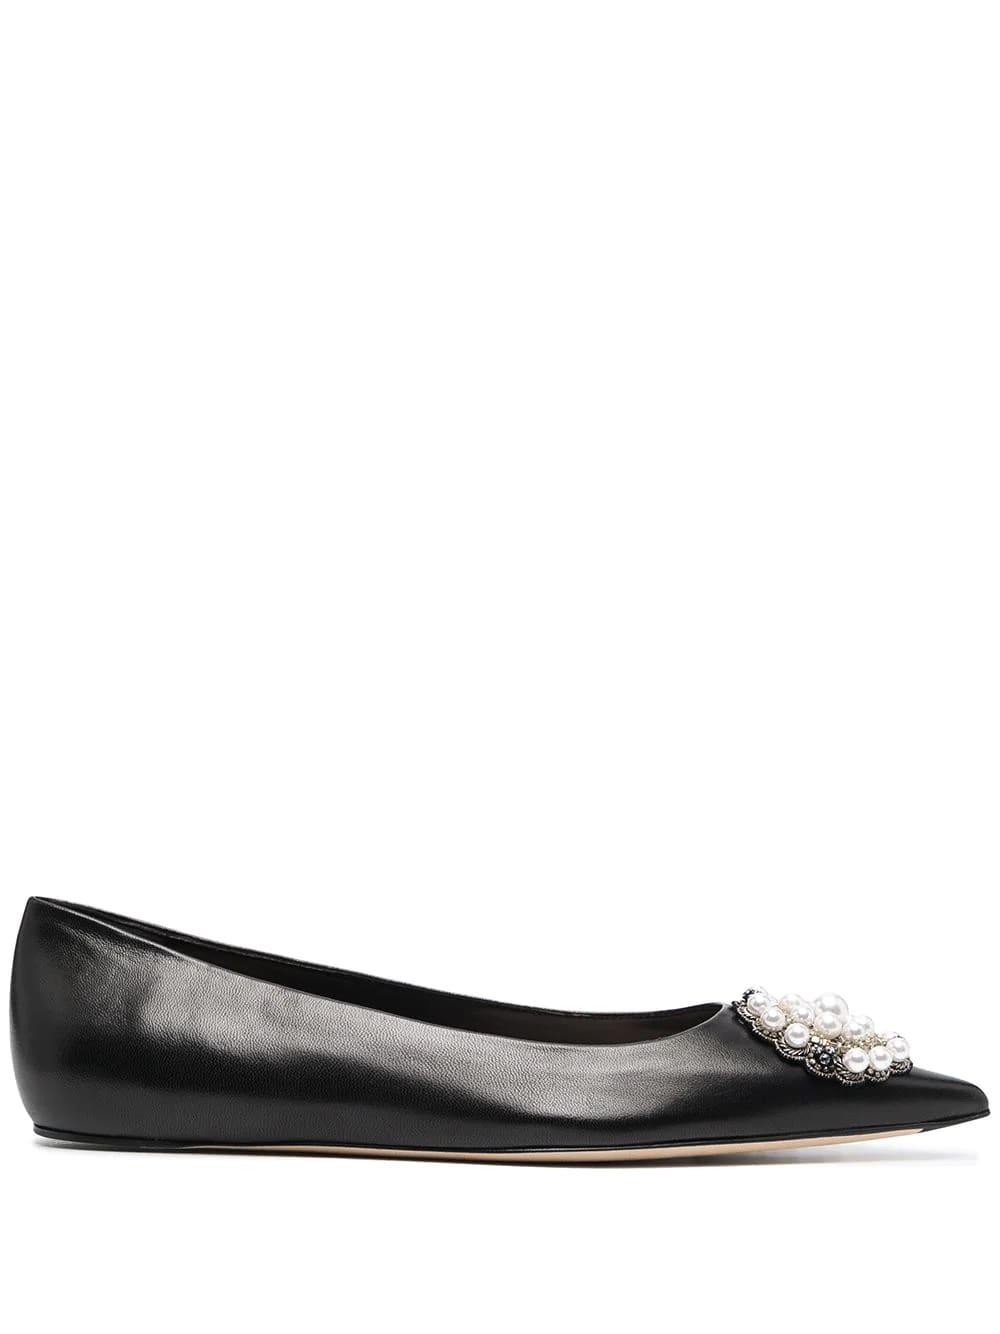 Buy Alexander McQueen Black Ballerina With Jewel Application online, shop Alexander McQueen shoes with free shipping